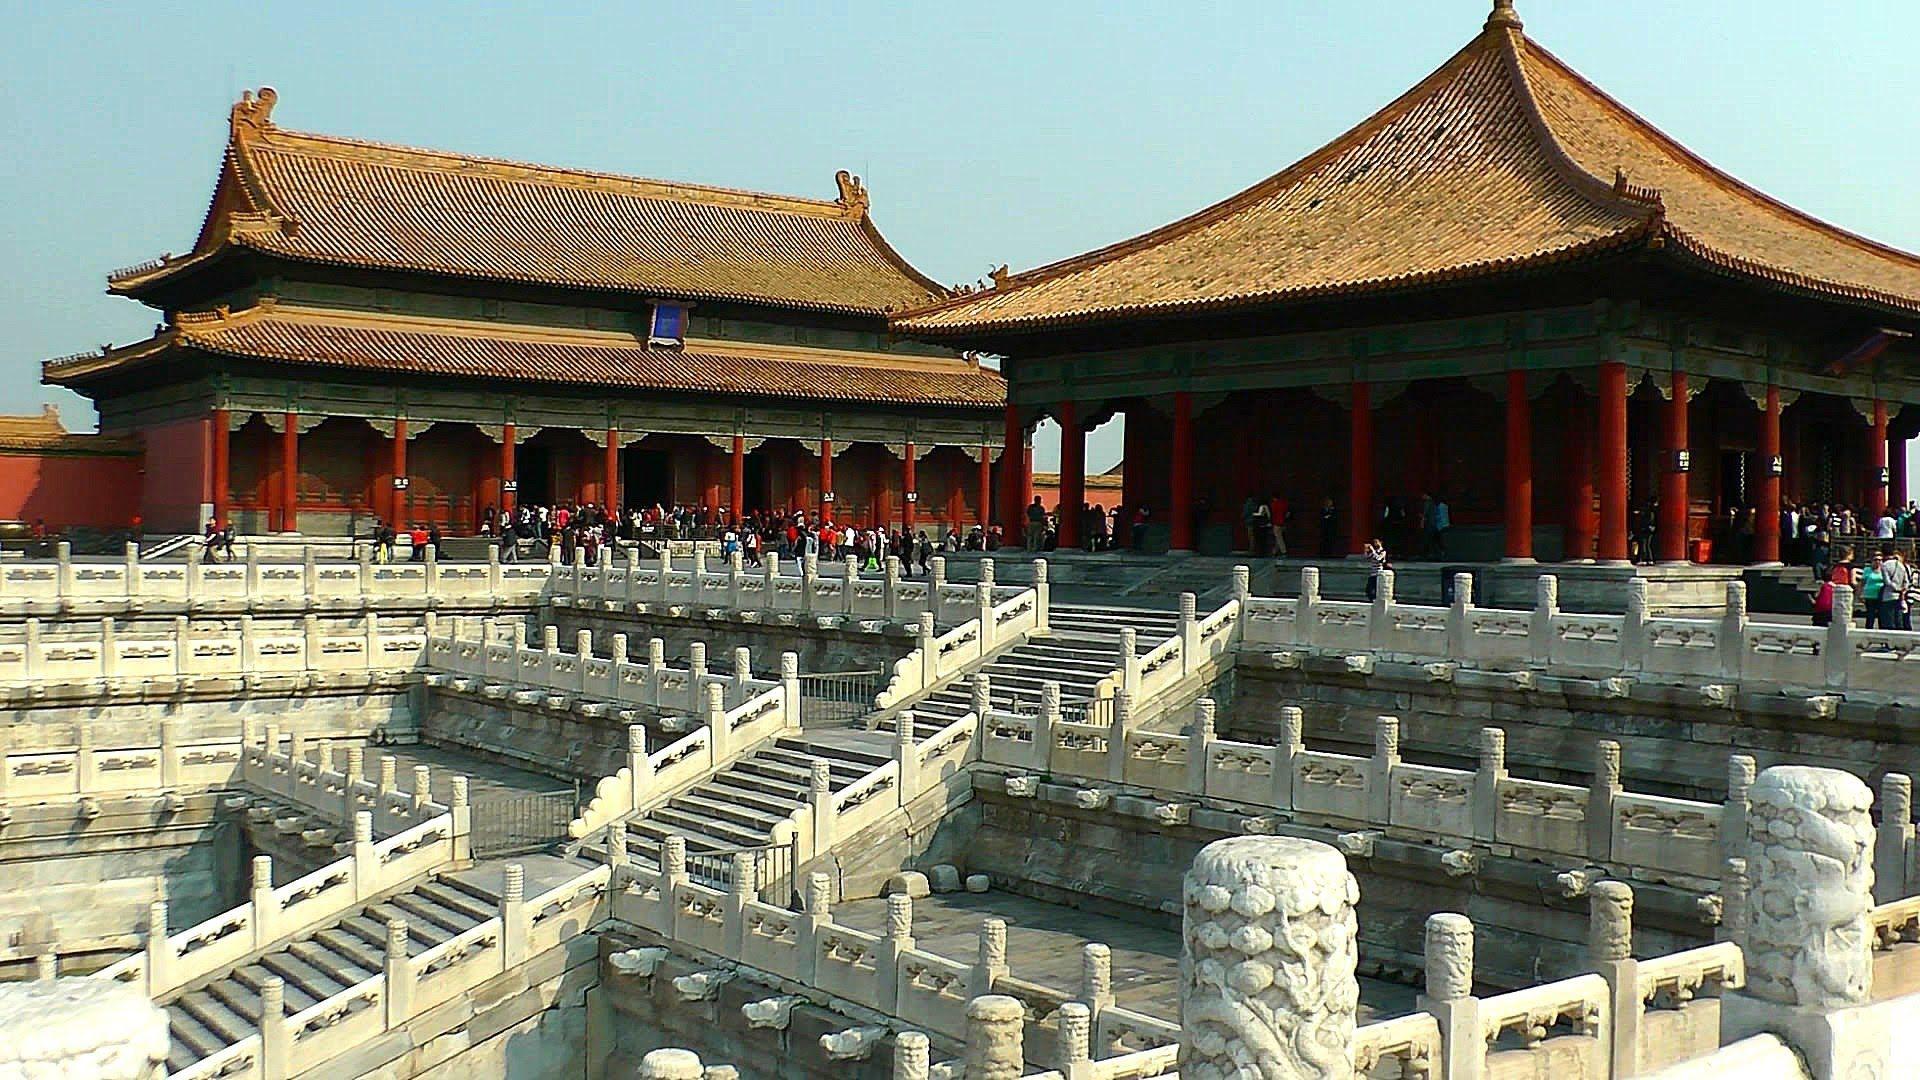 Forbidden City | Beijing, China Attractions - Lonely Planet  |Imperial Palace Forbidden City Beijing China